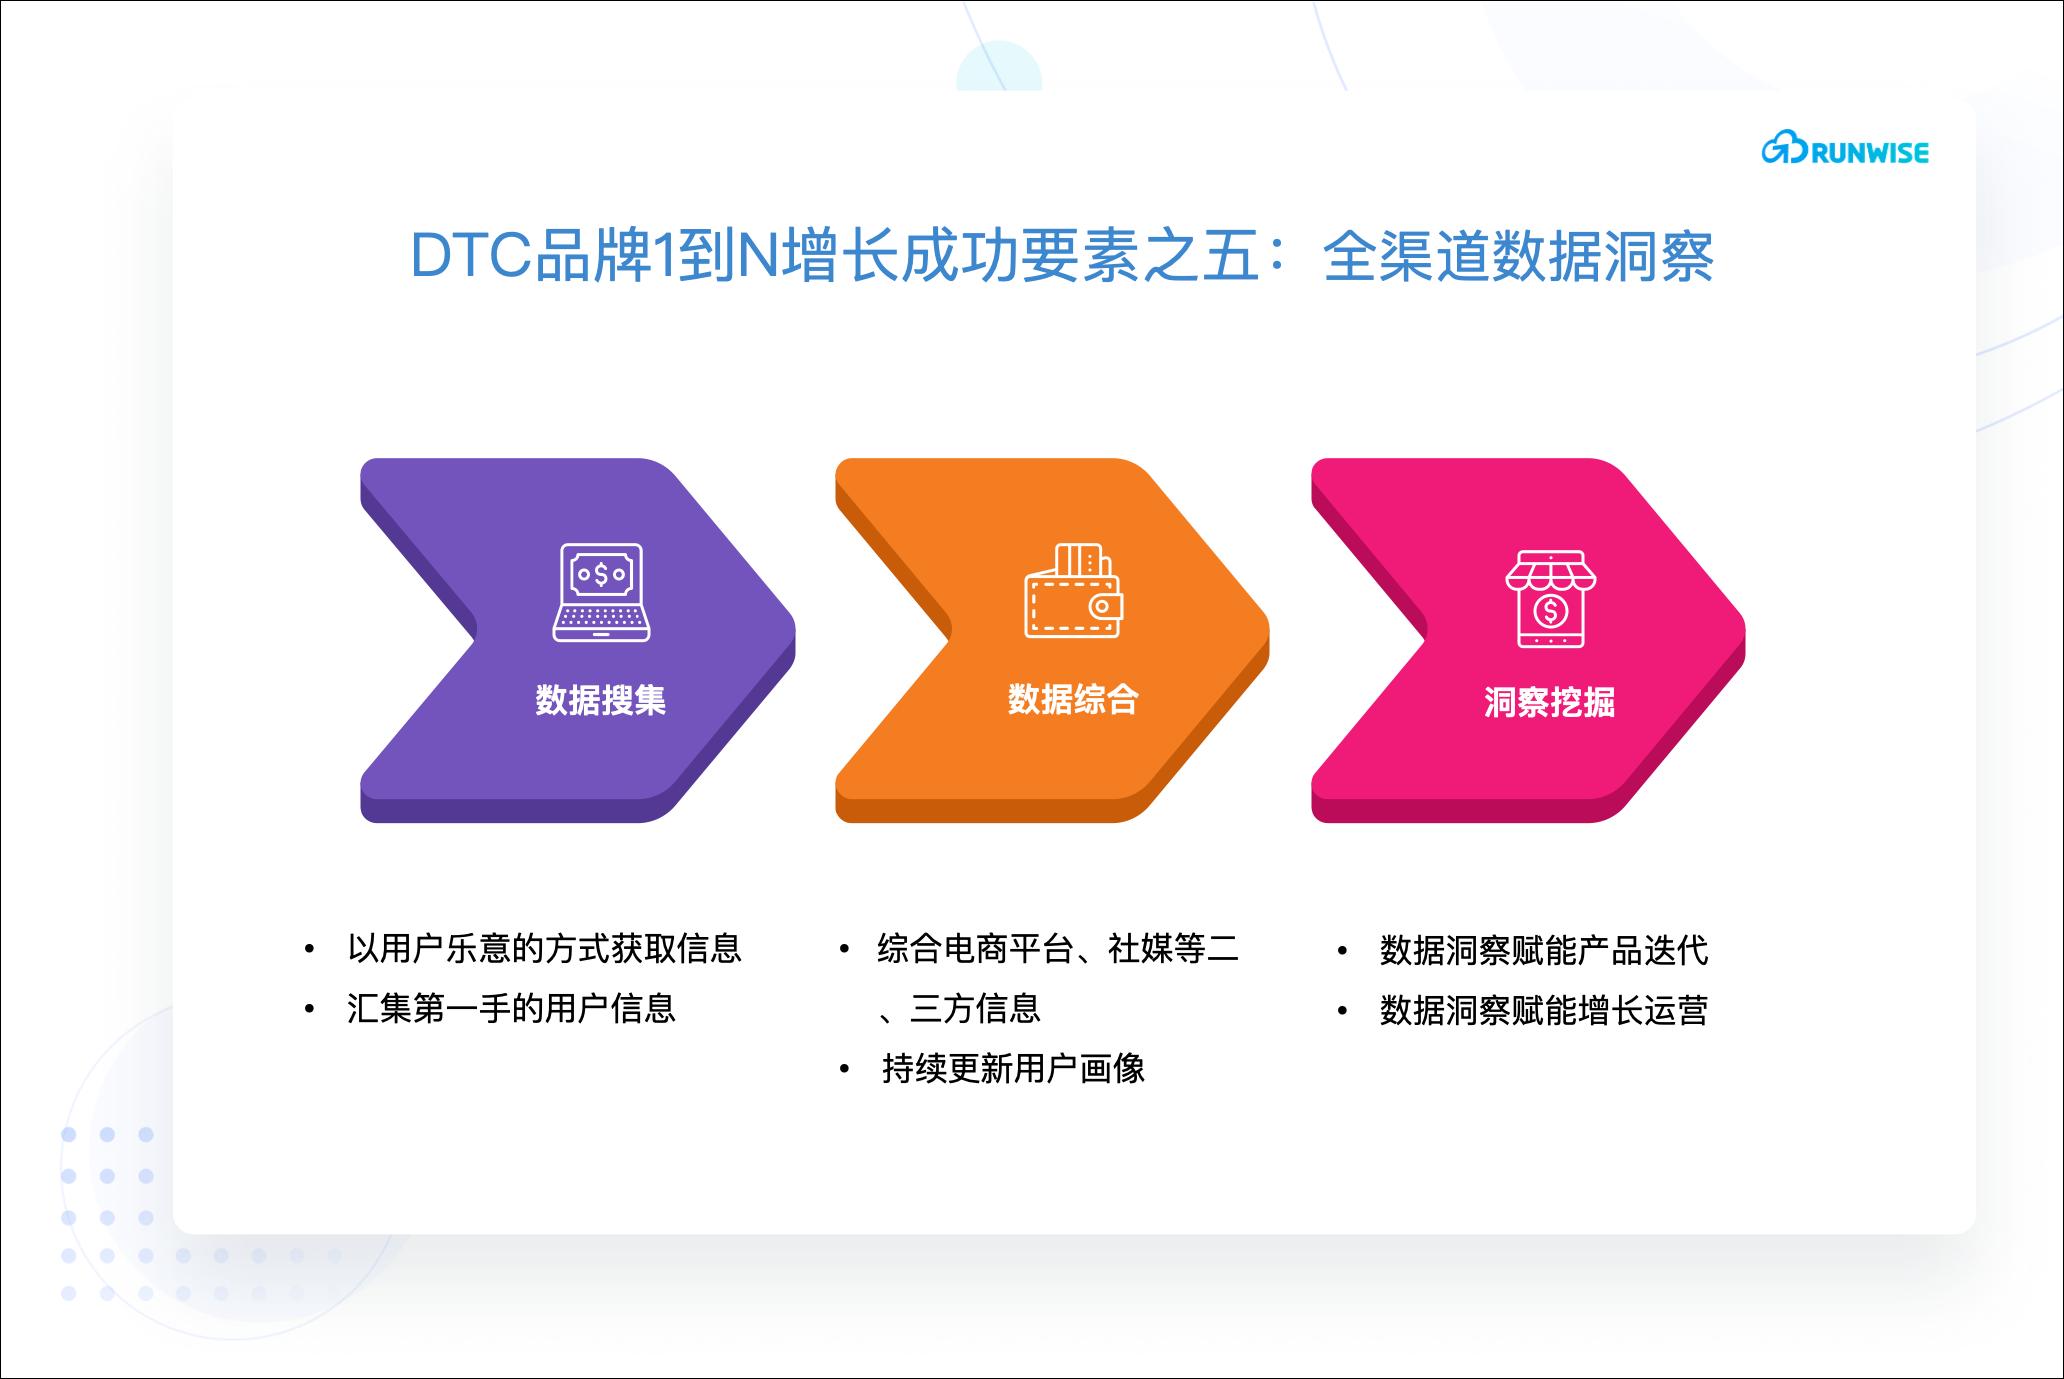 DTC品牌增长创新-全渠道数据洞察